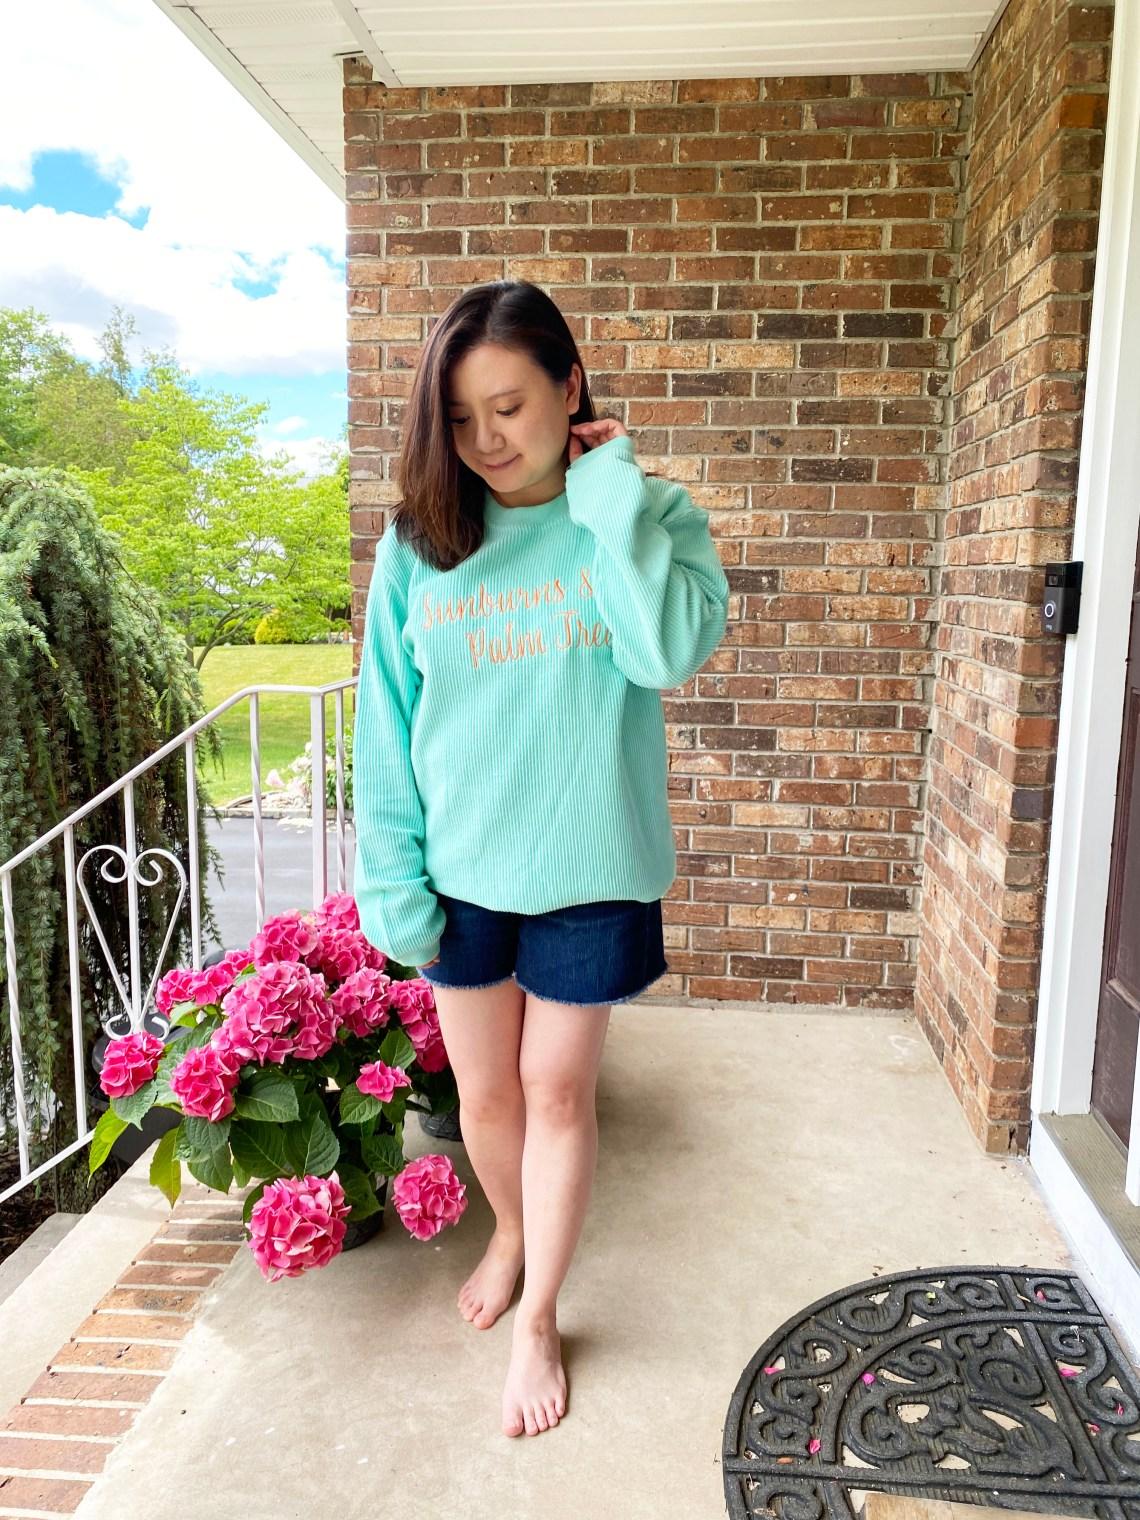 Sunburns-Palm-Trees-Corded-Sweatshirt